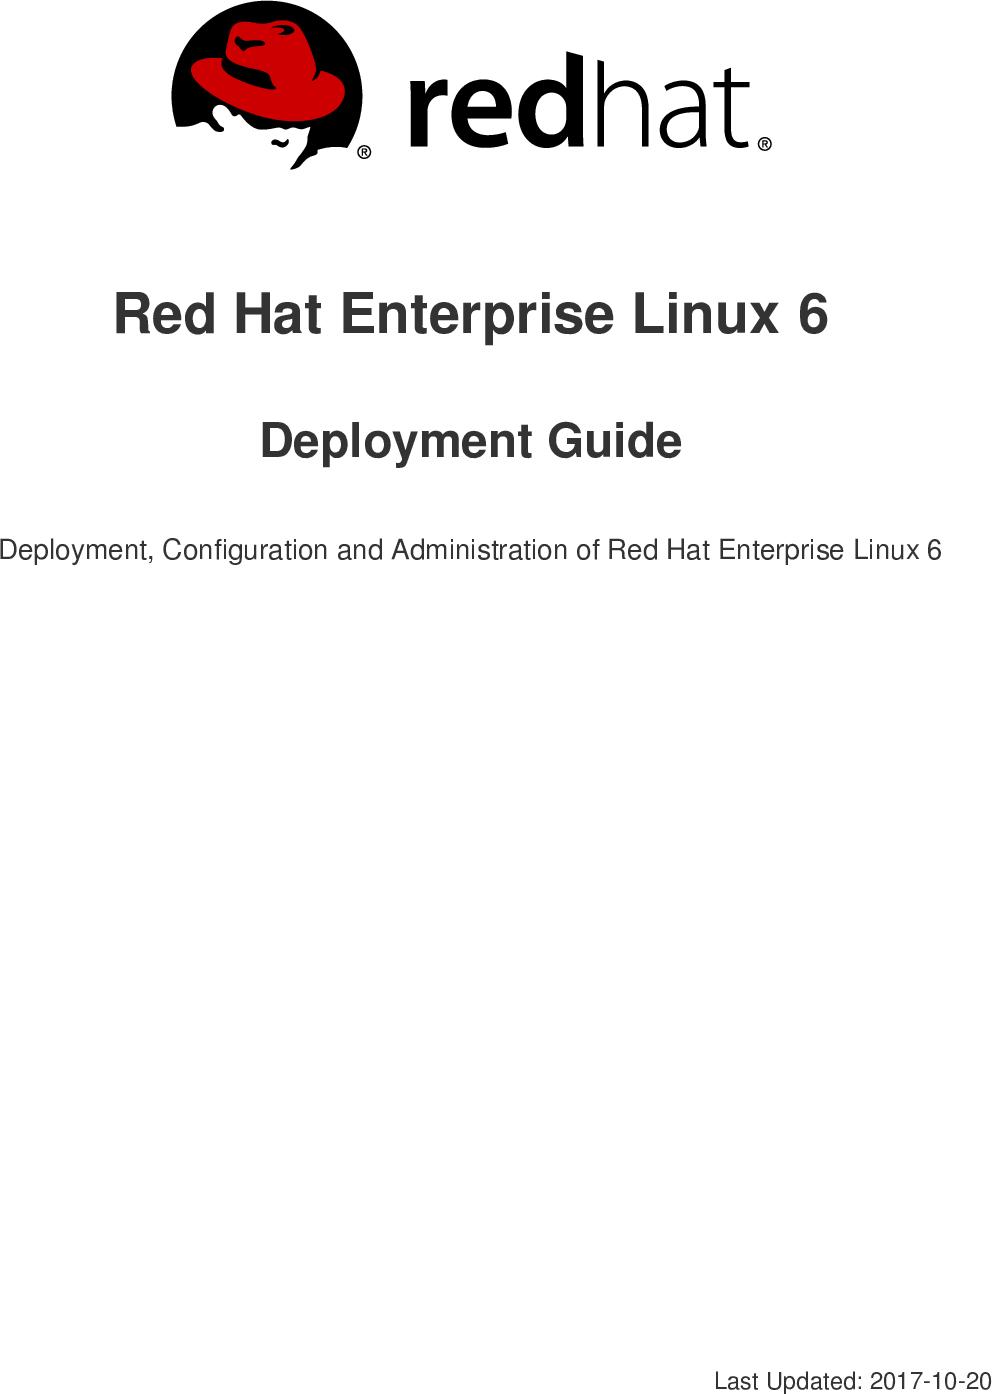 Deployment Guide Rhel6 dp